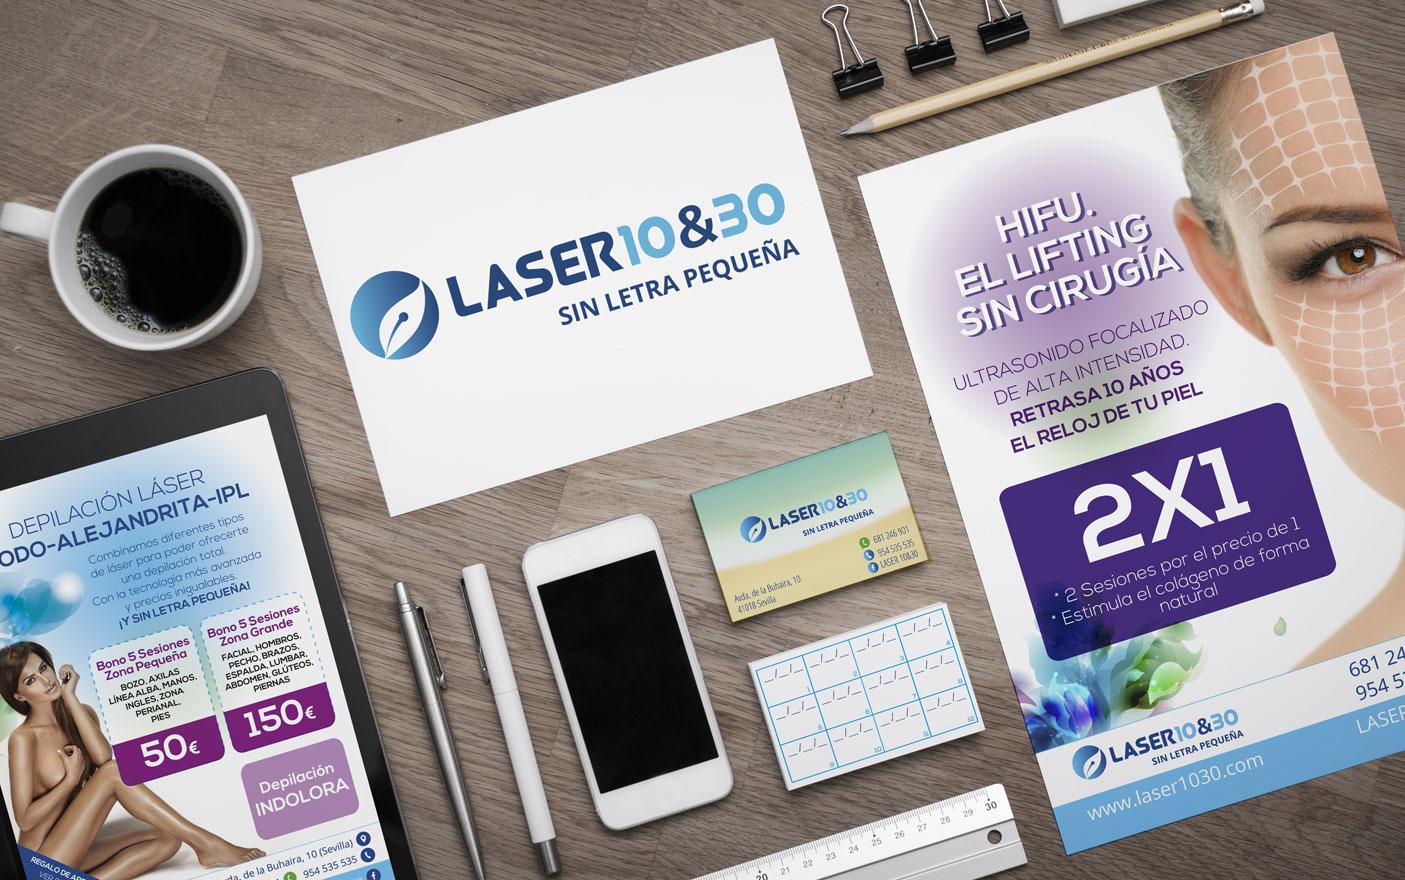 laser1030-marca-2.jpg